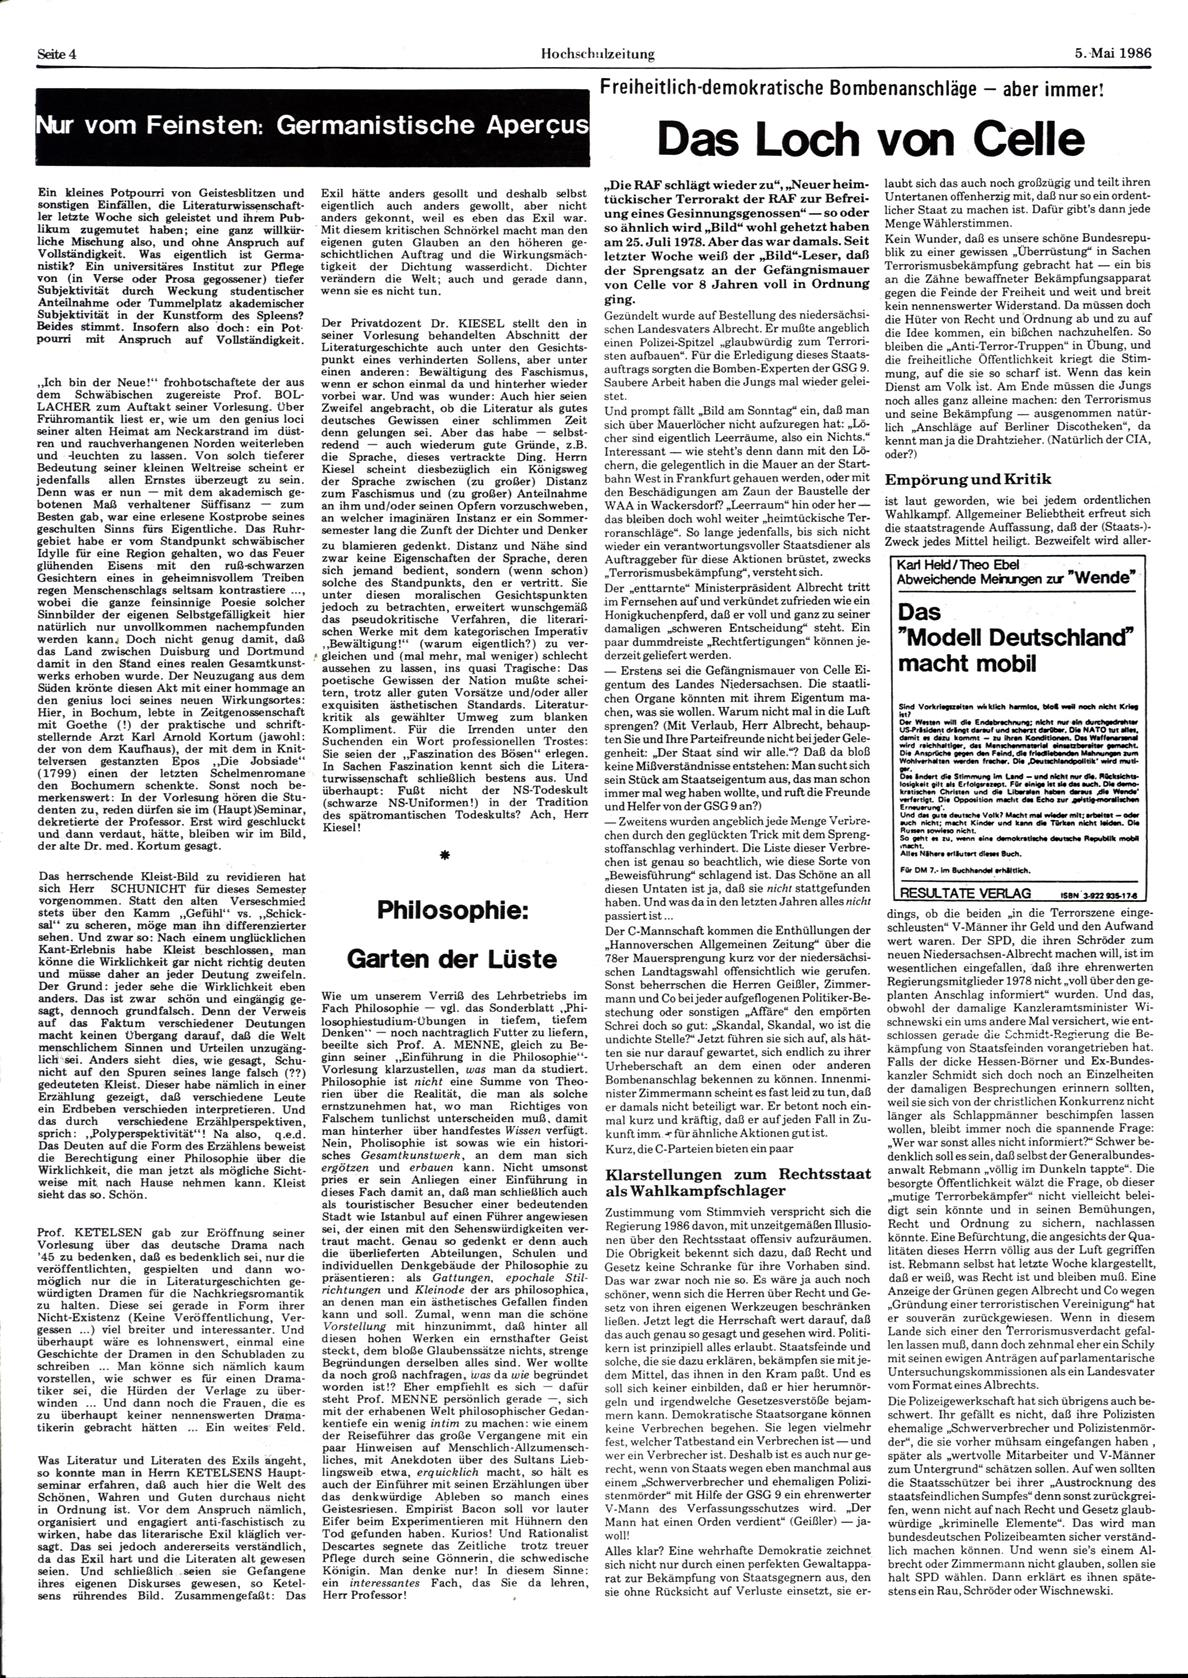 Bochum_BHZ_19860505_128_004